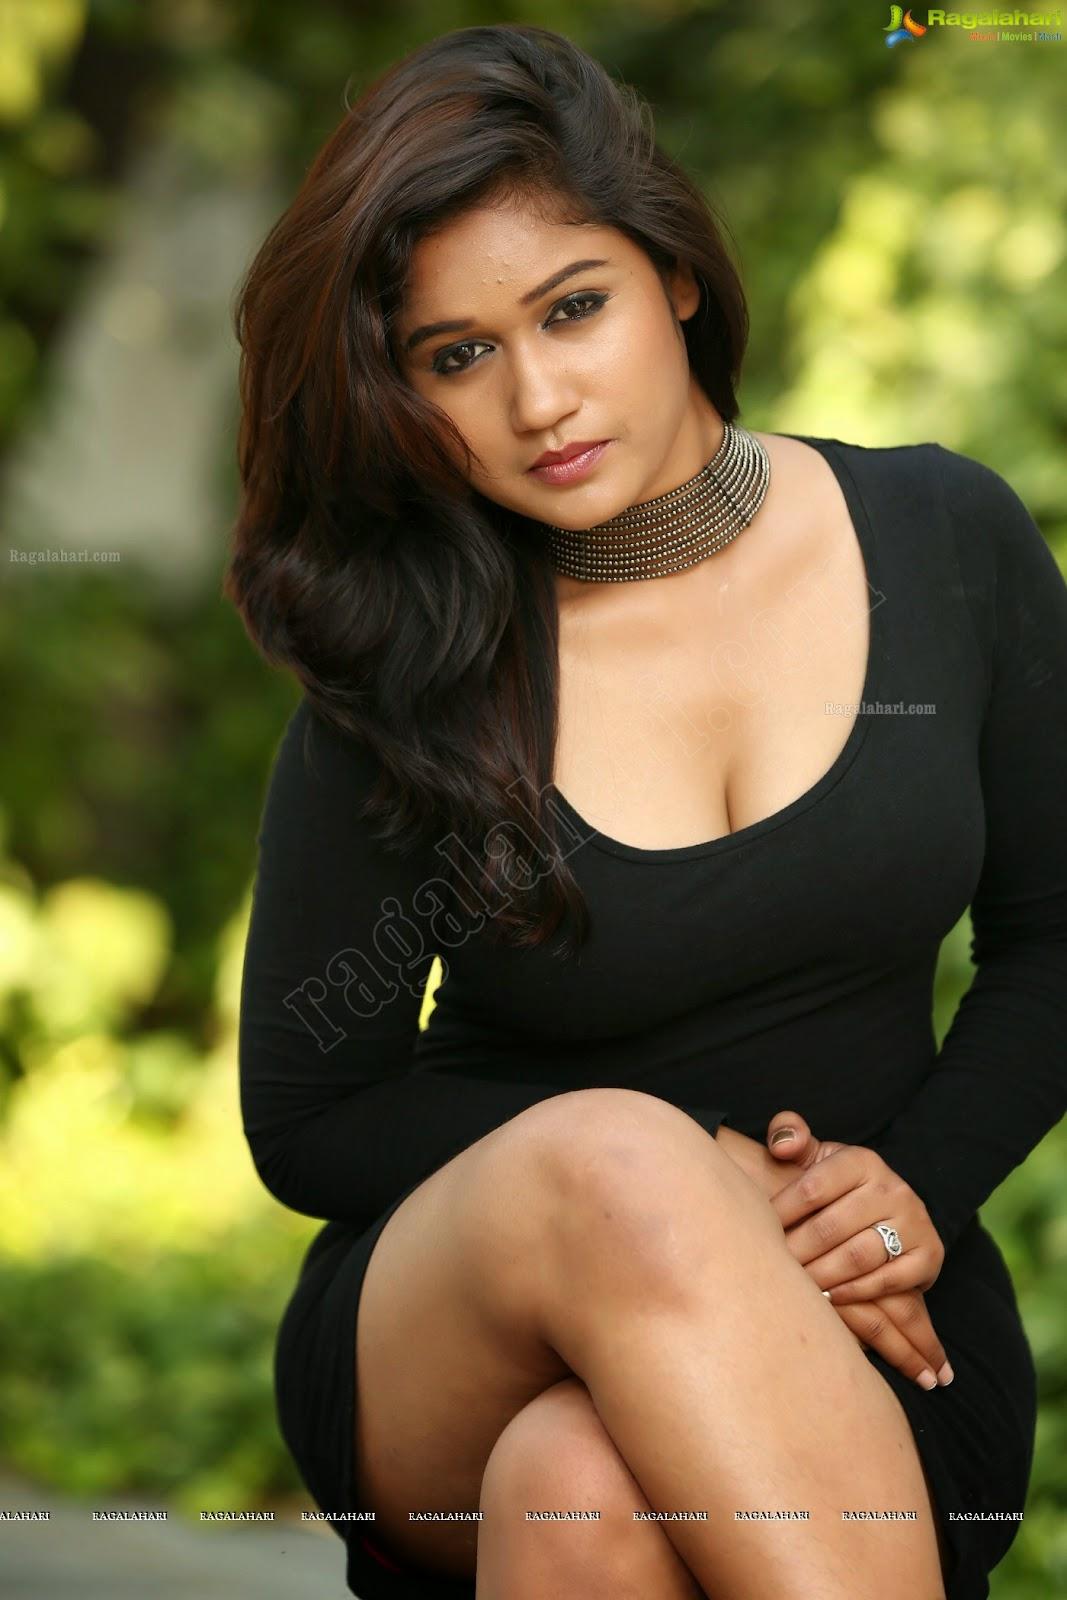 Telugu College Girls Nude Images